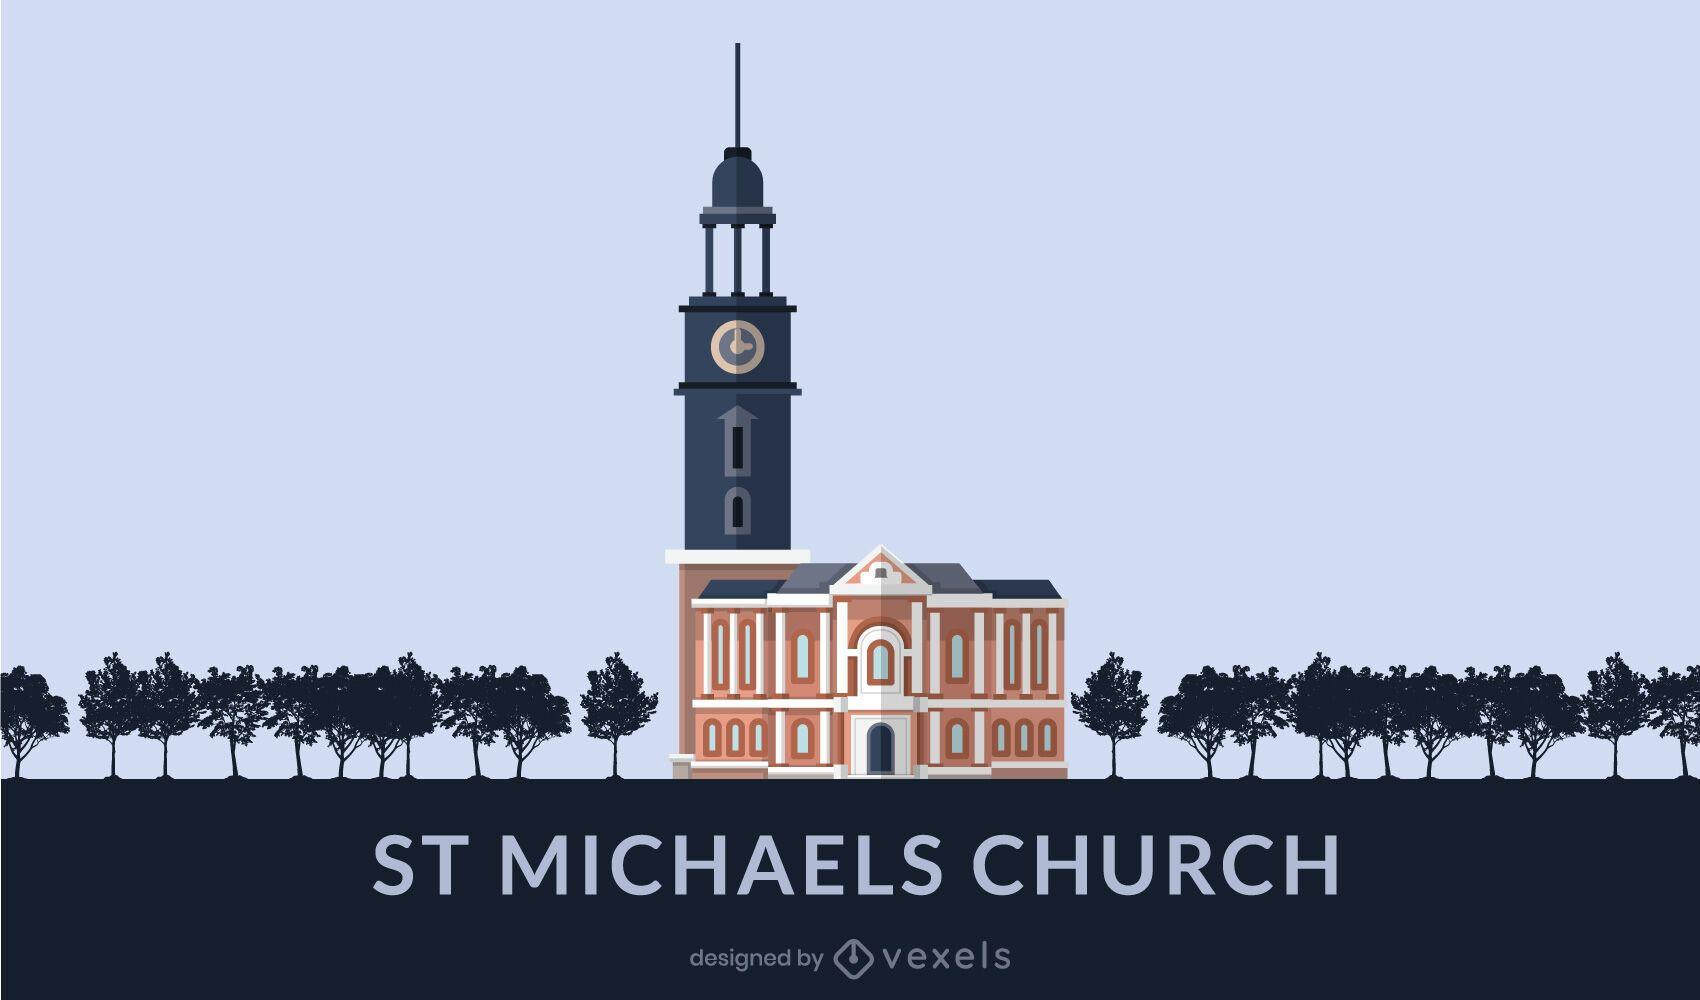 St. Michael's Church Flat Design Landmark